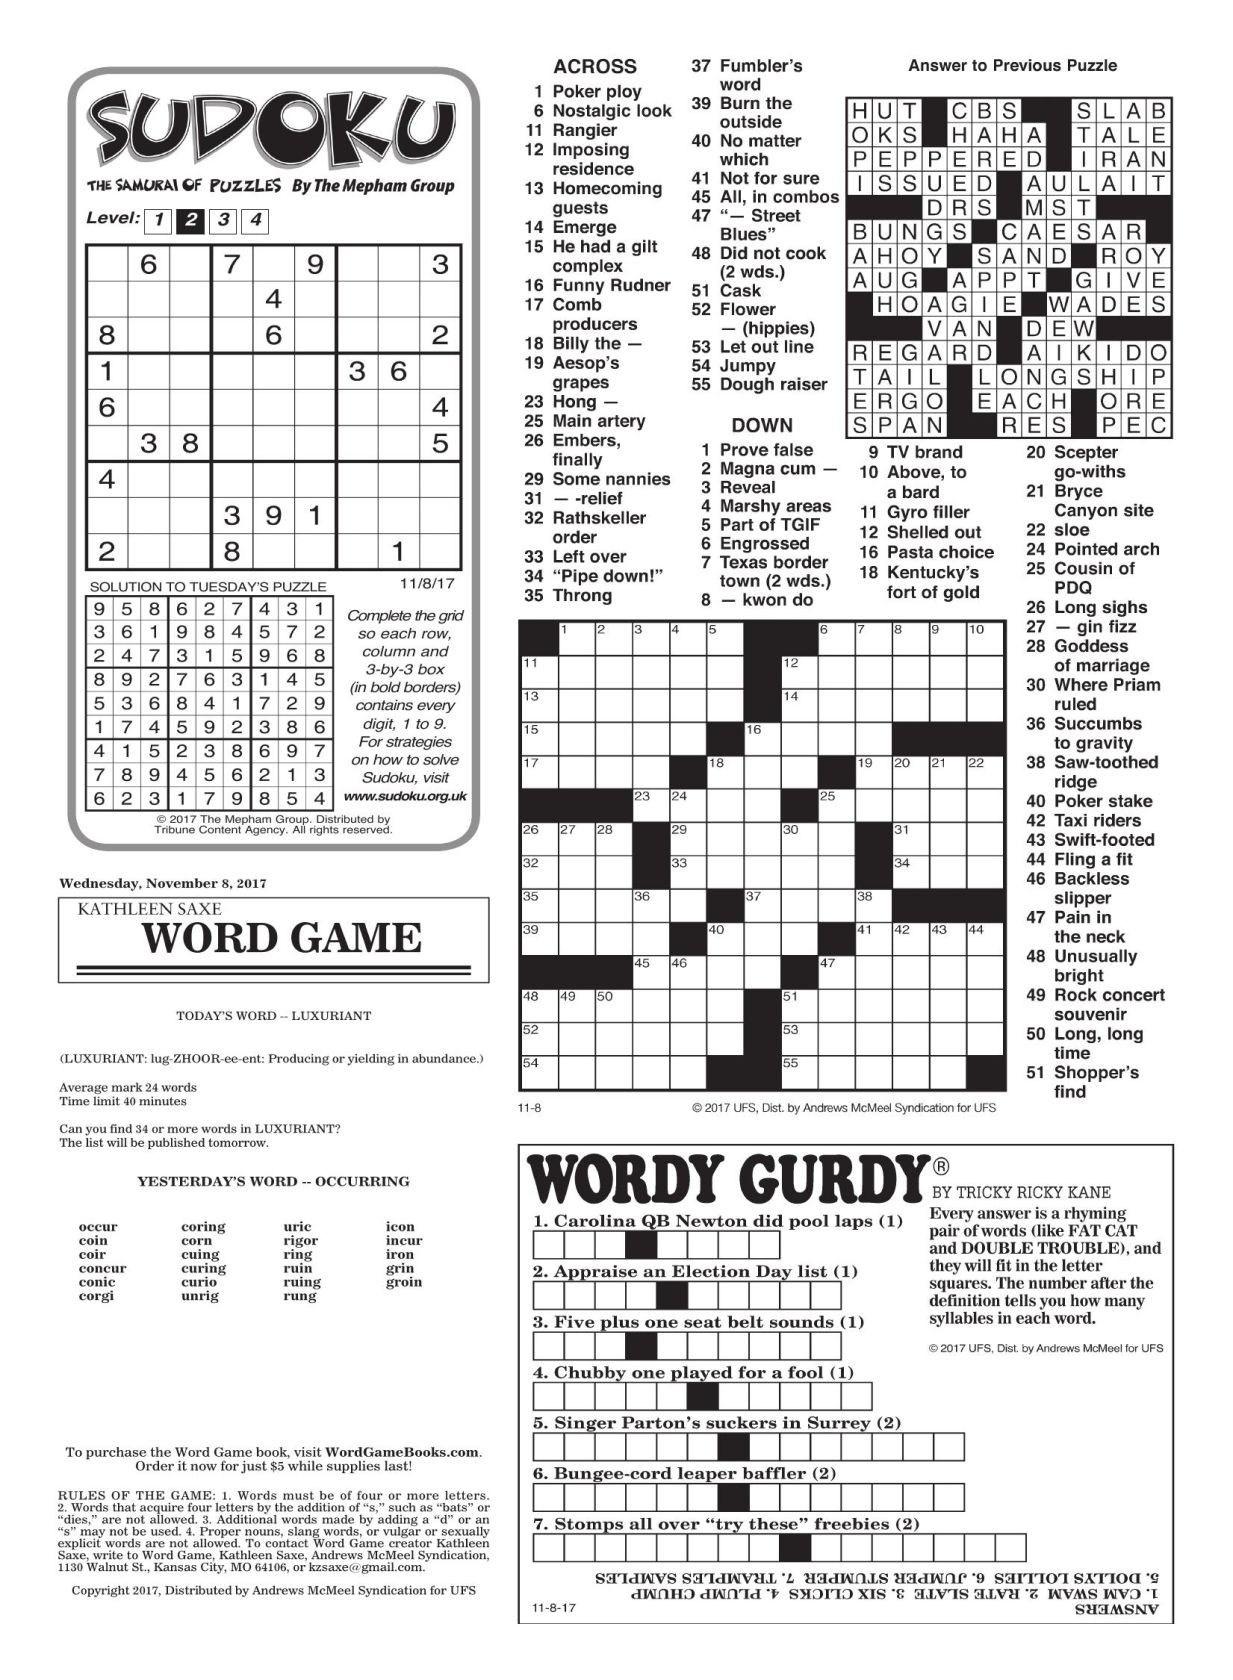 Printable Crossword Puzzles La Times Crossword Puzzle La Times - La Times Printable Crossword Puzzles November 2017